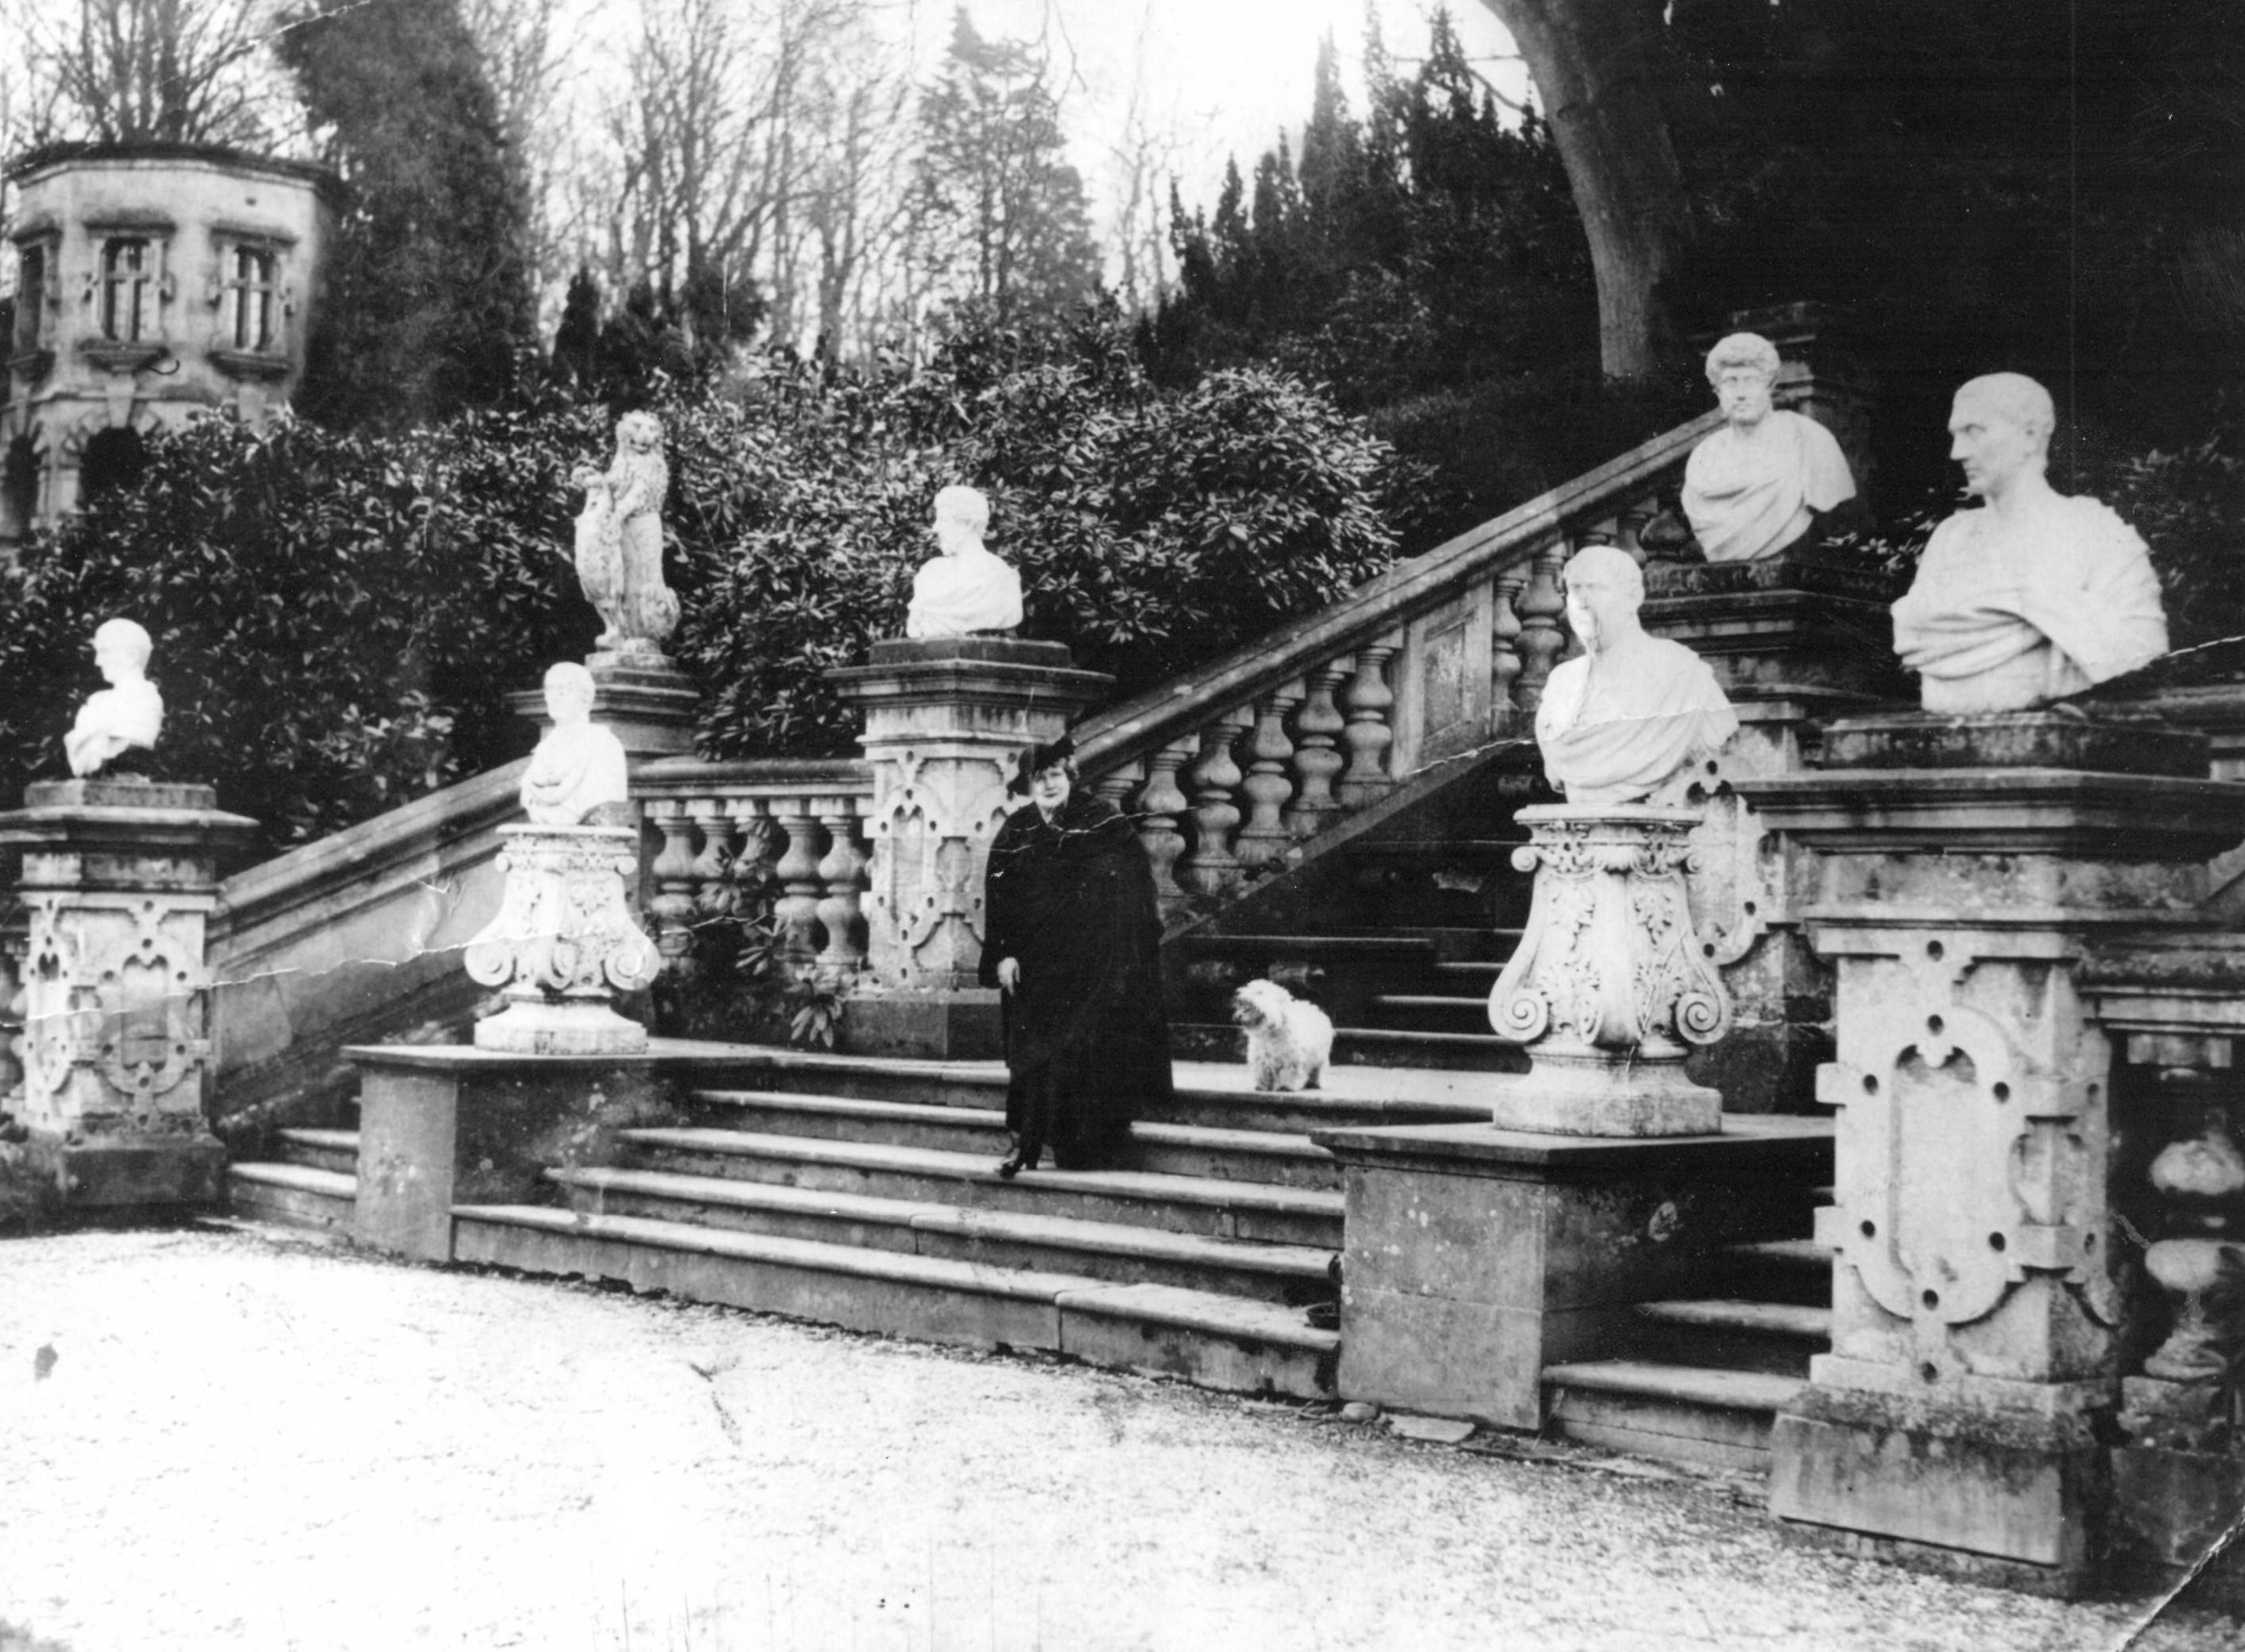 harlaxton manor to grantham castle